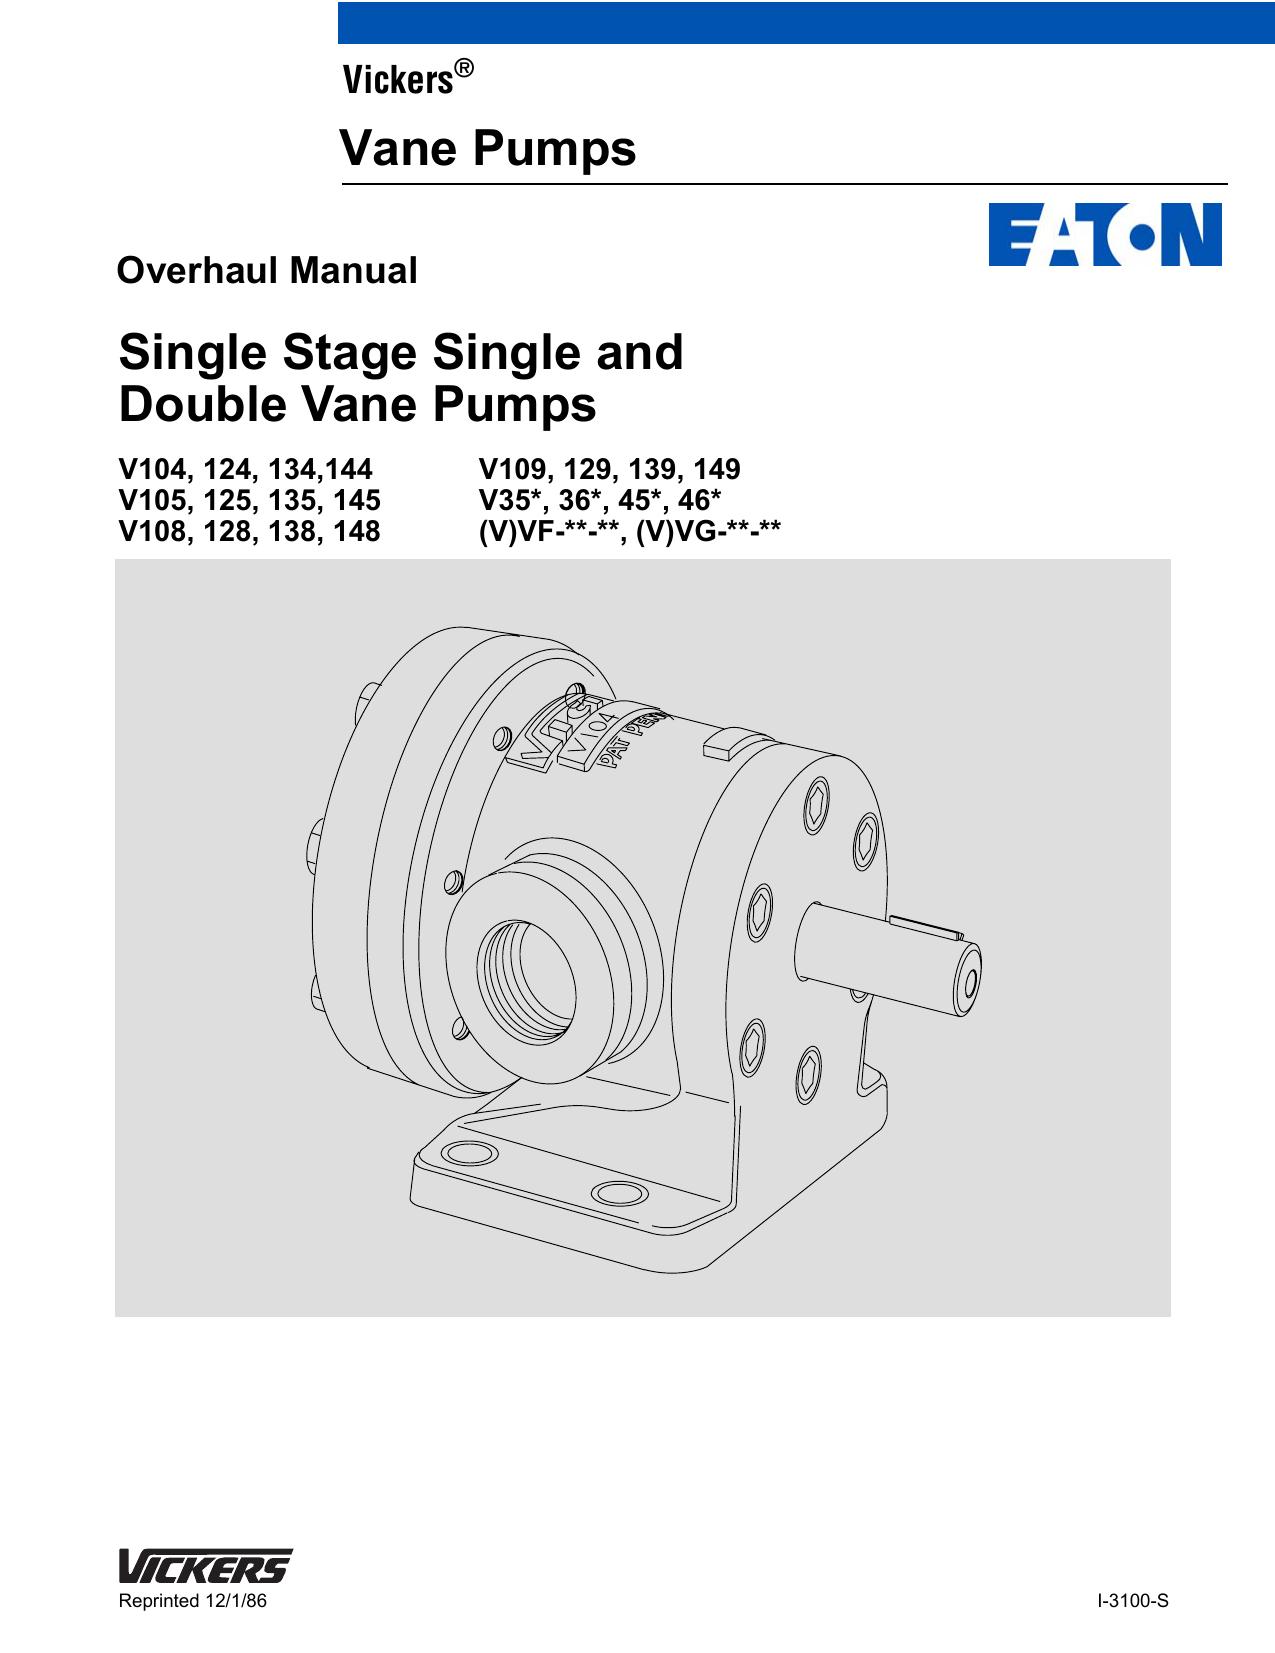 Single Stage Single and Double Vane Pumps Vane | manualzz com